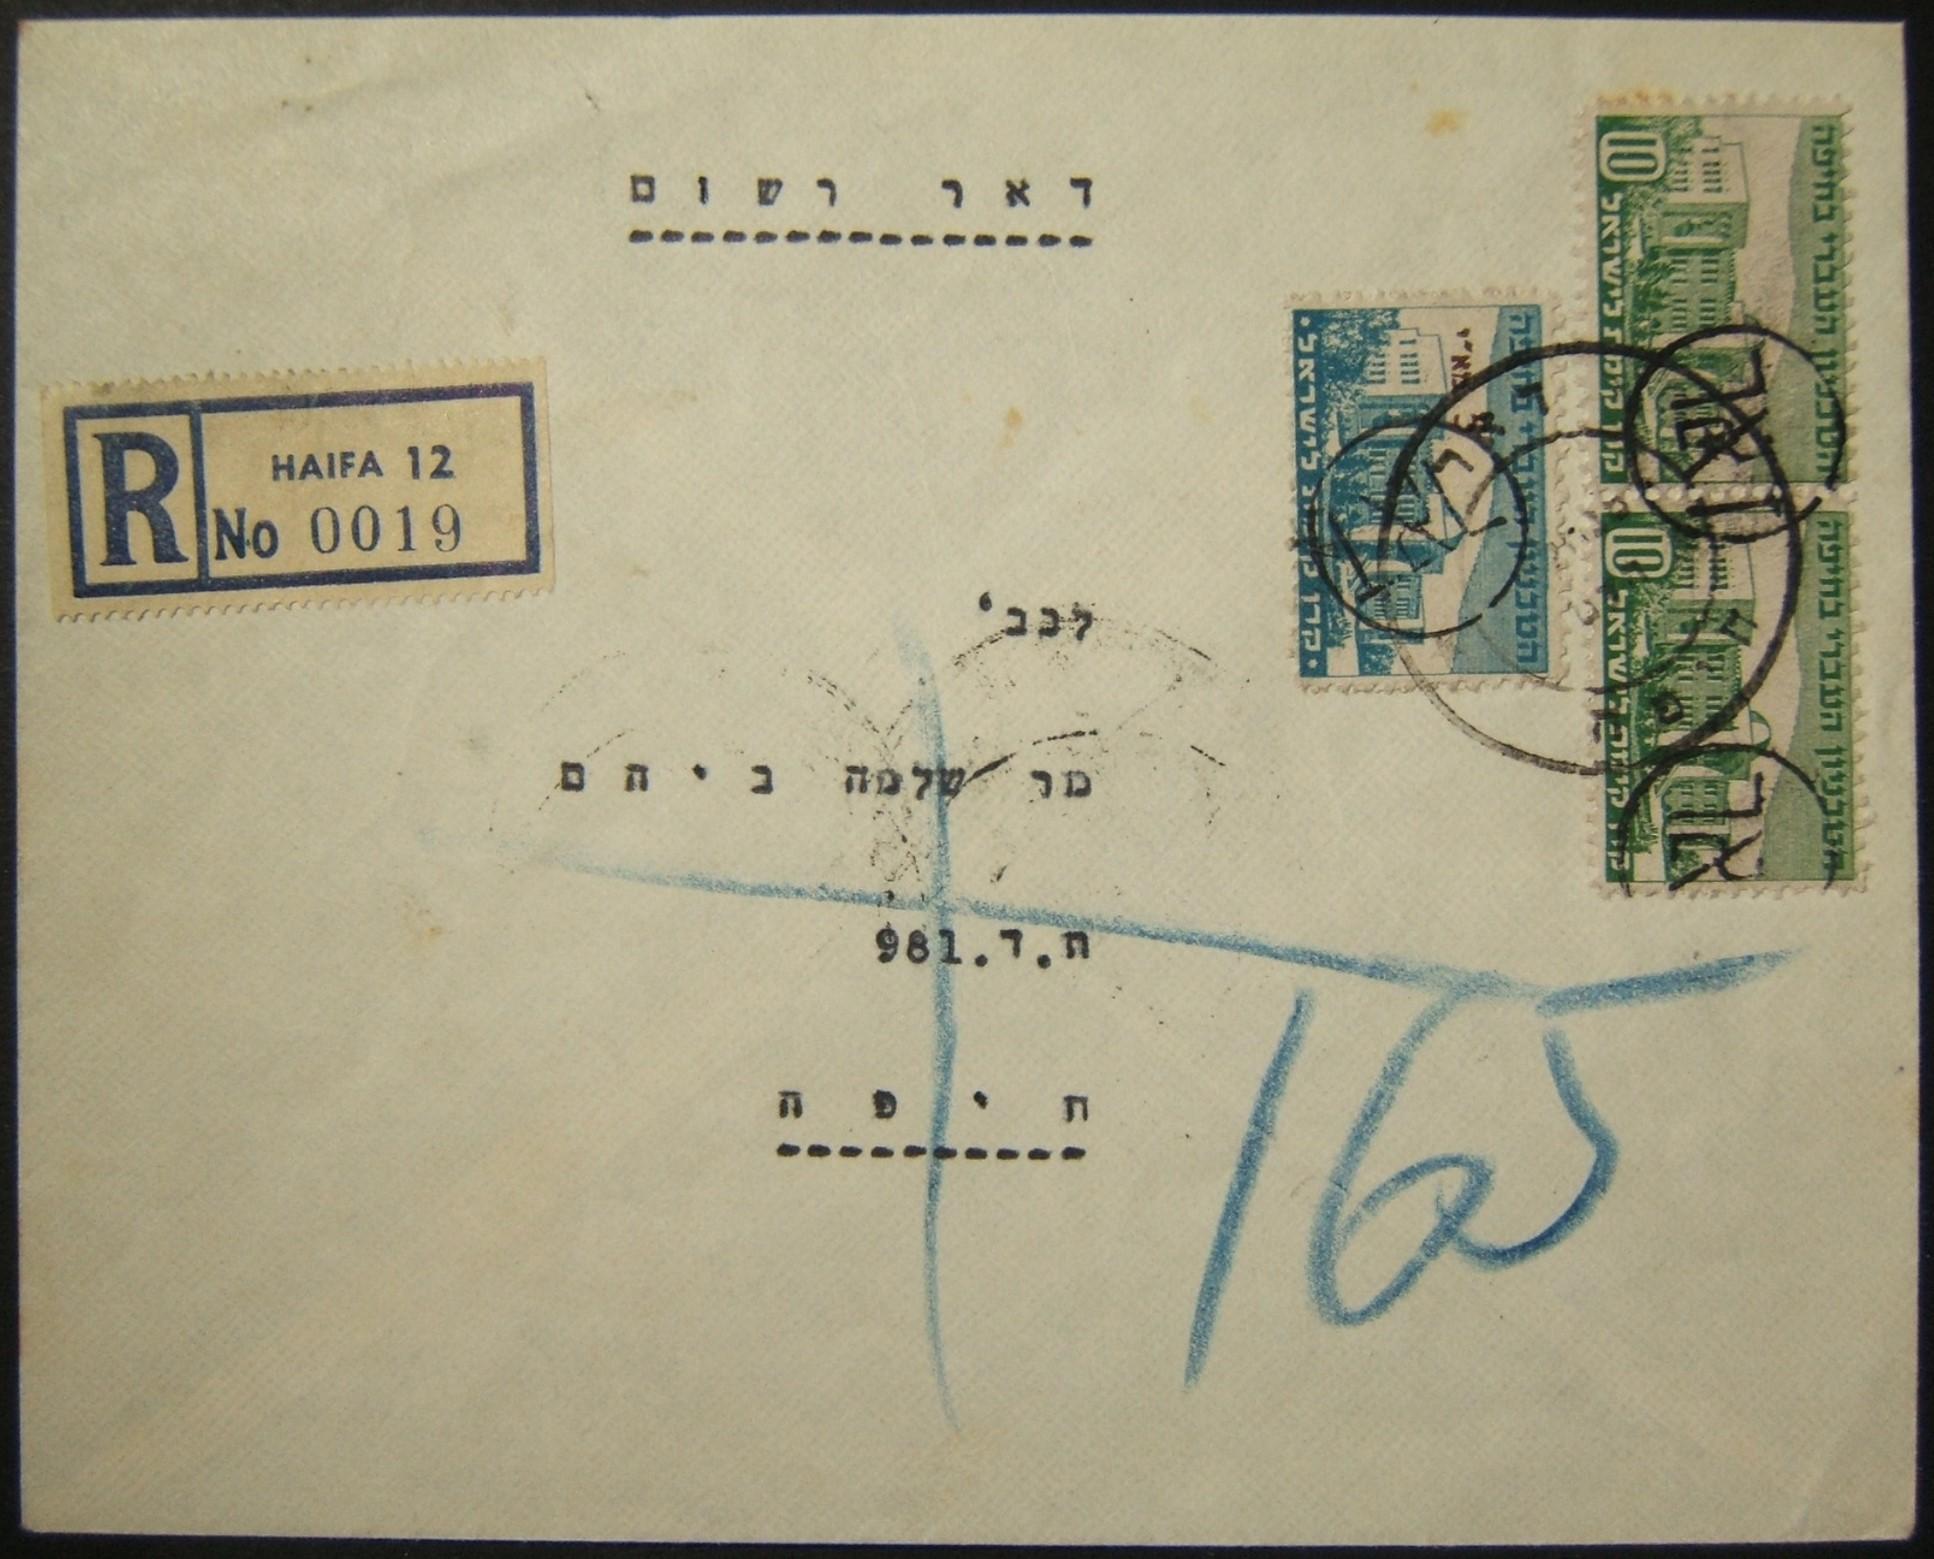 1948 early Interim HAIFA registered cover with Interim & Mandate postal markings